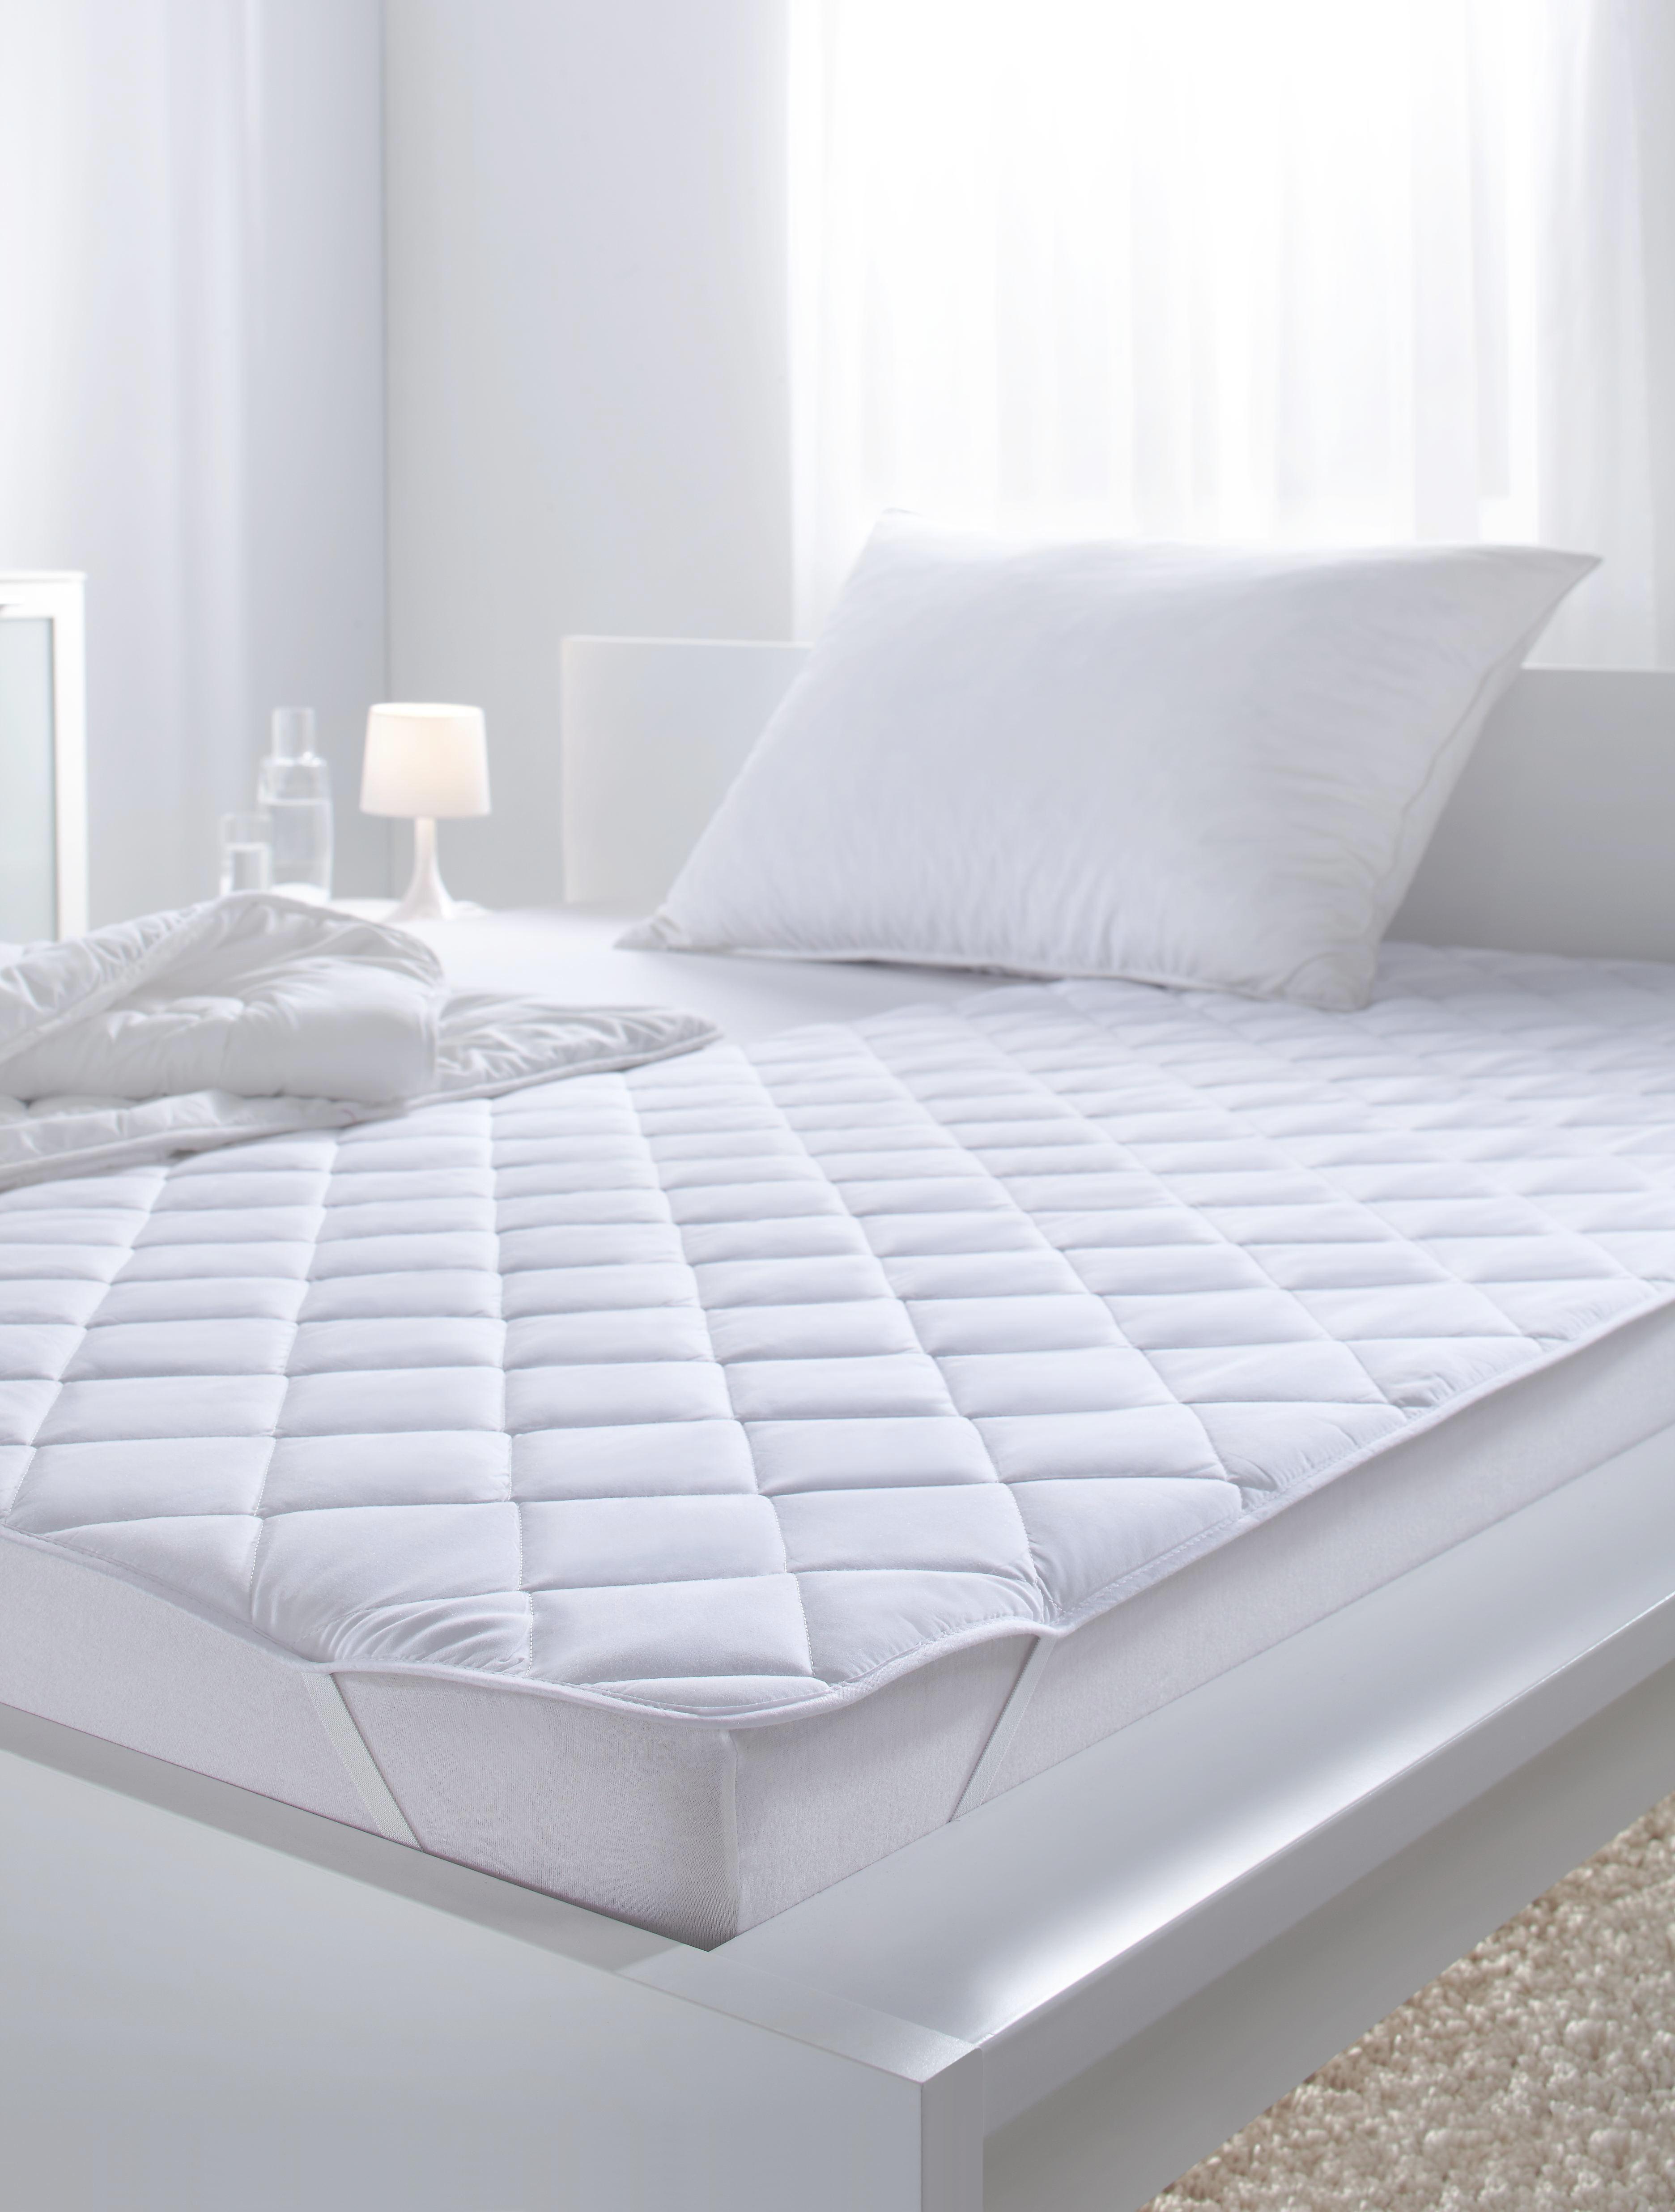 Unterbett in Weiß, ca. 95x195cm - Weiß, Textil (95/195cm) - MÖMAX modern living